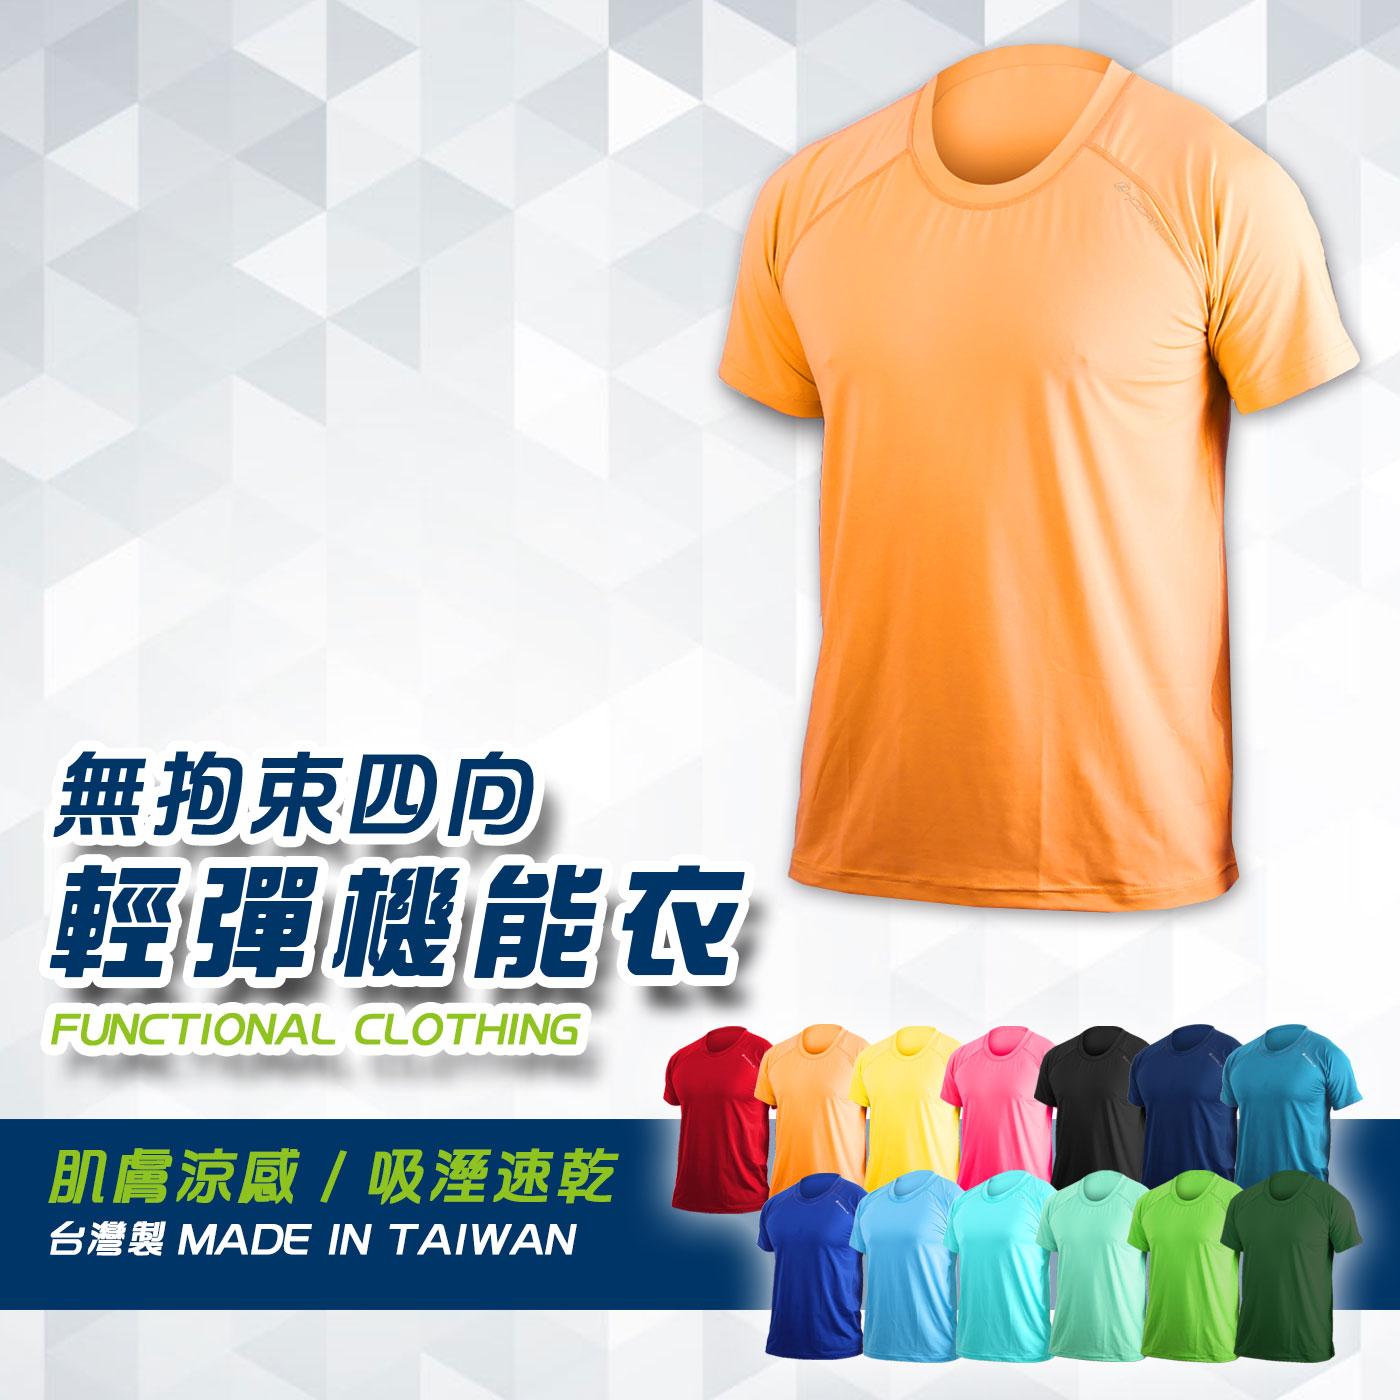 HODARLA 男女無拘束短袖T恤-輕彈 抗UV 圓領 台灣製 涼感 路跑 橘@3114809@